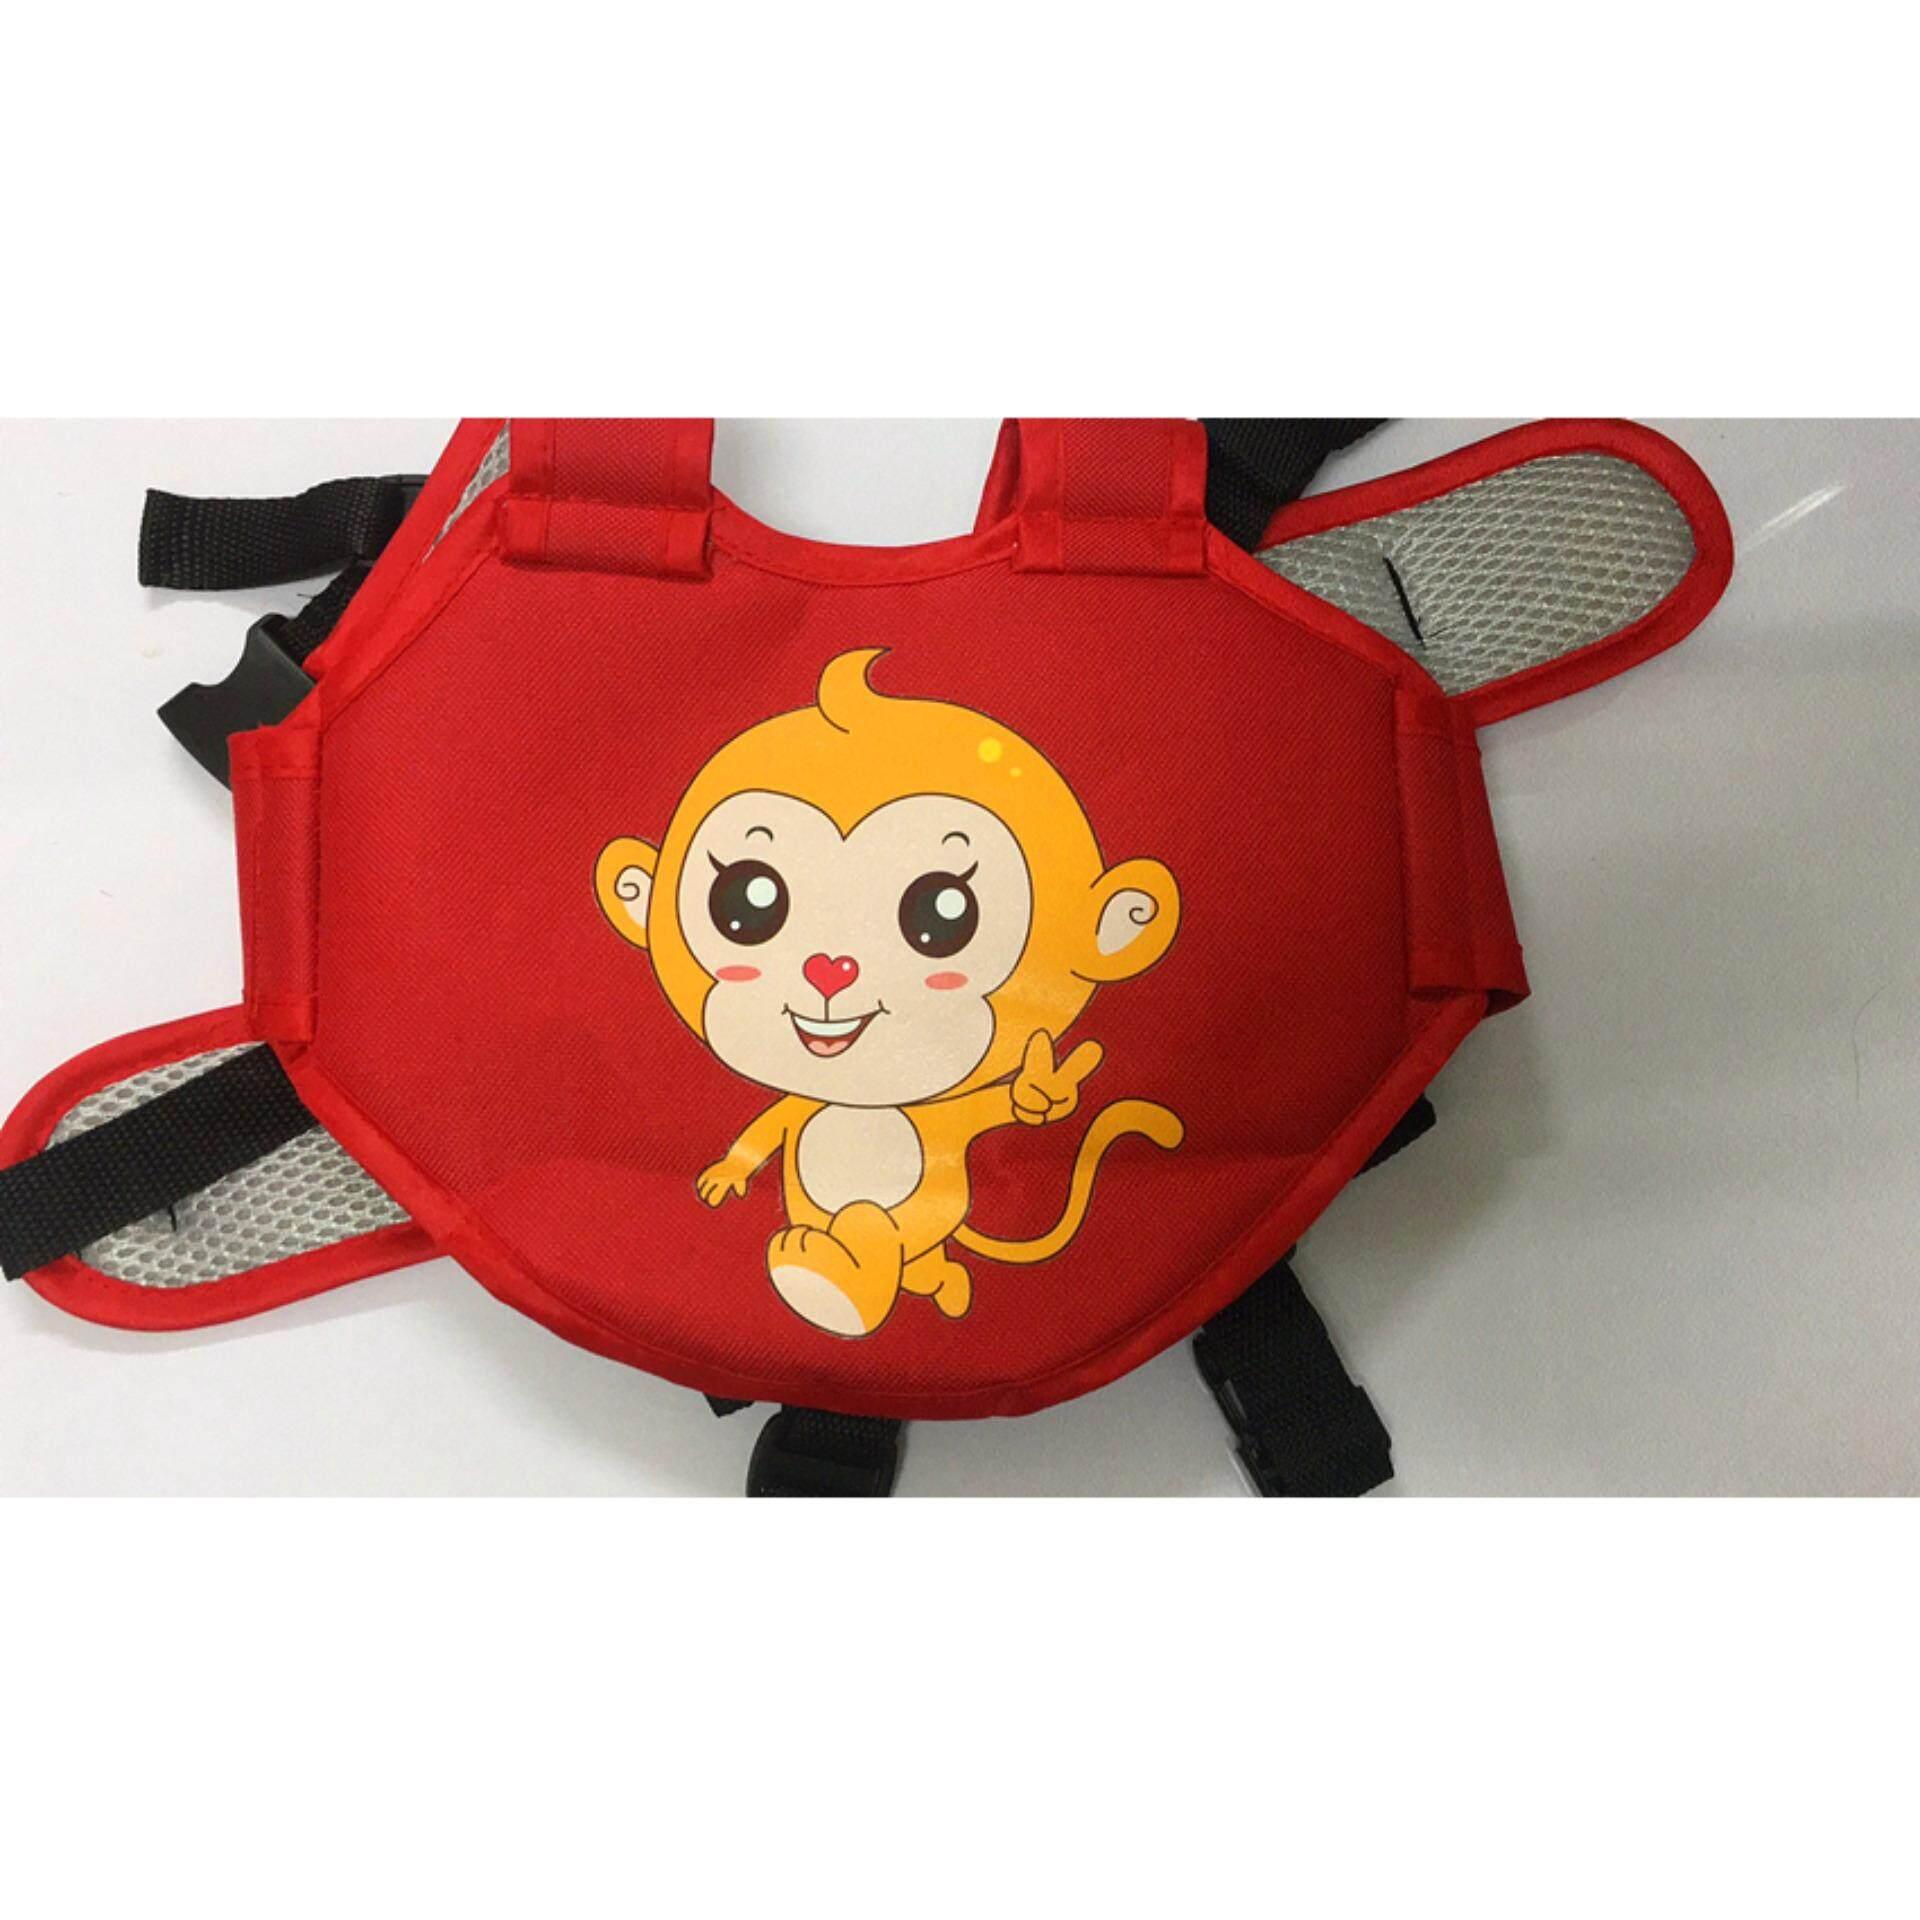 Baby Life สายรัดนิรภัยกันเด็กตกรถมอเตอร์ไซต์ สำหรับเด็กอายุ 3 - 10 ปี แบบกระเป๋าเป้สะพายหลัง สำหรับขับขี่มอเตอร์ไซต์ By Baby Life.